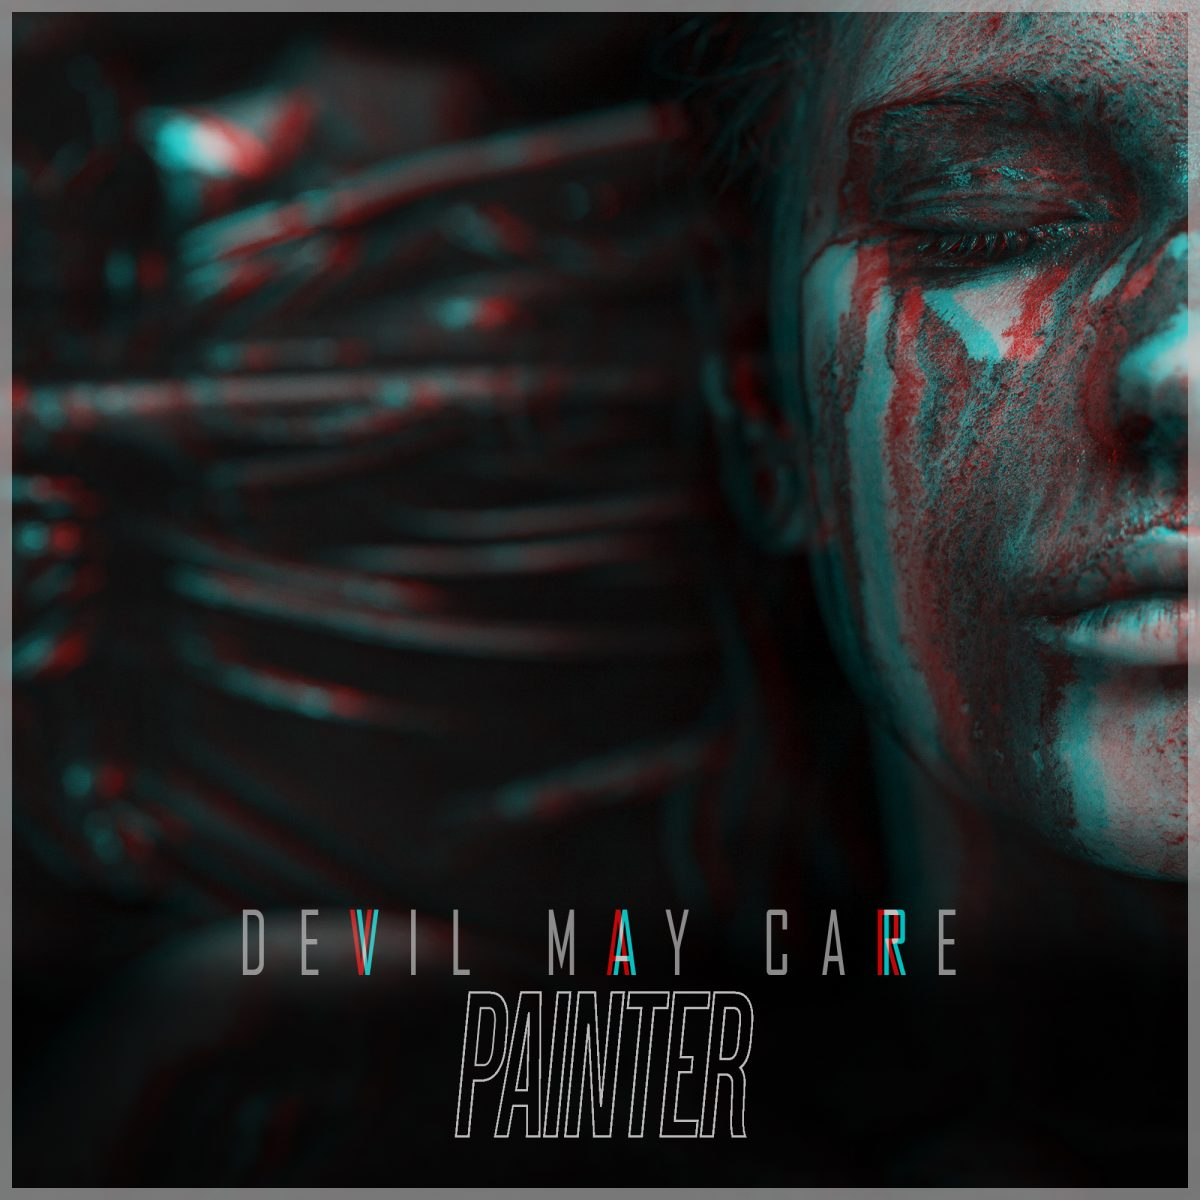 devil-may-care-painter-single-vorstellung